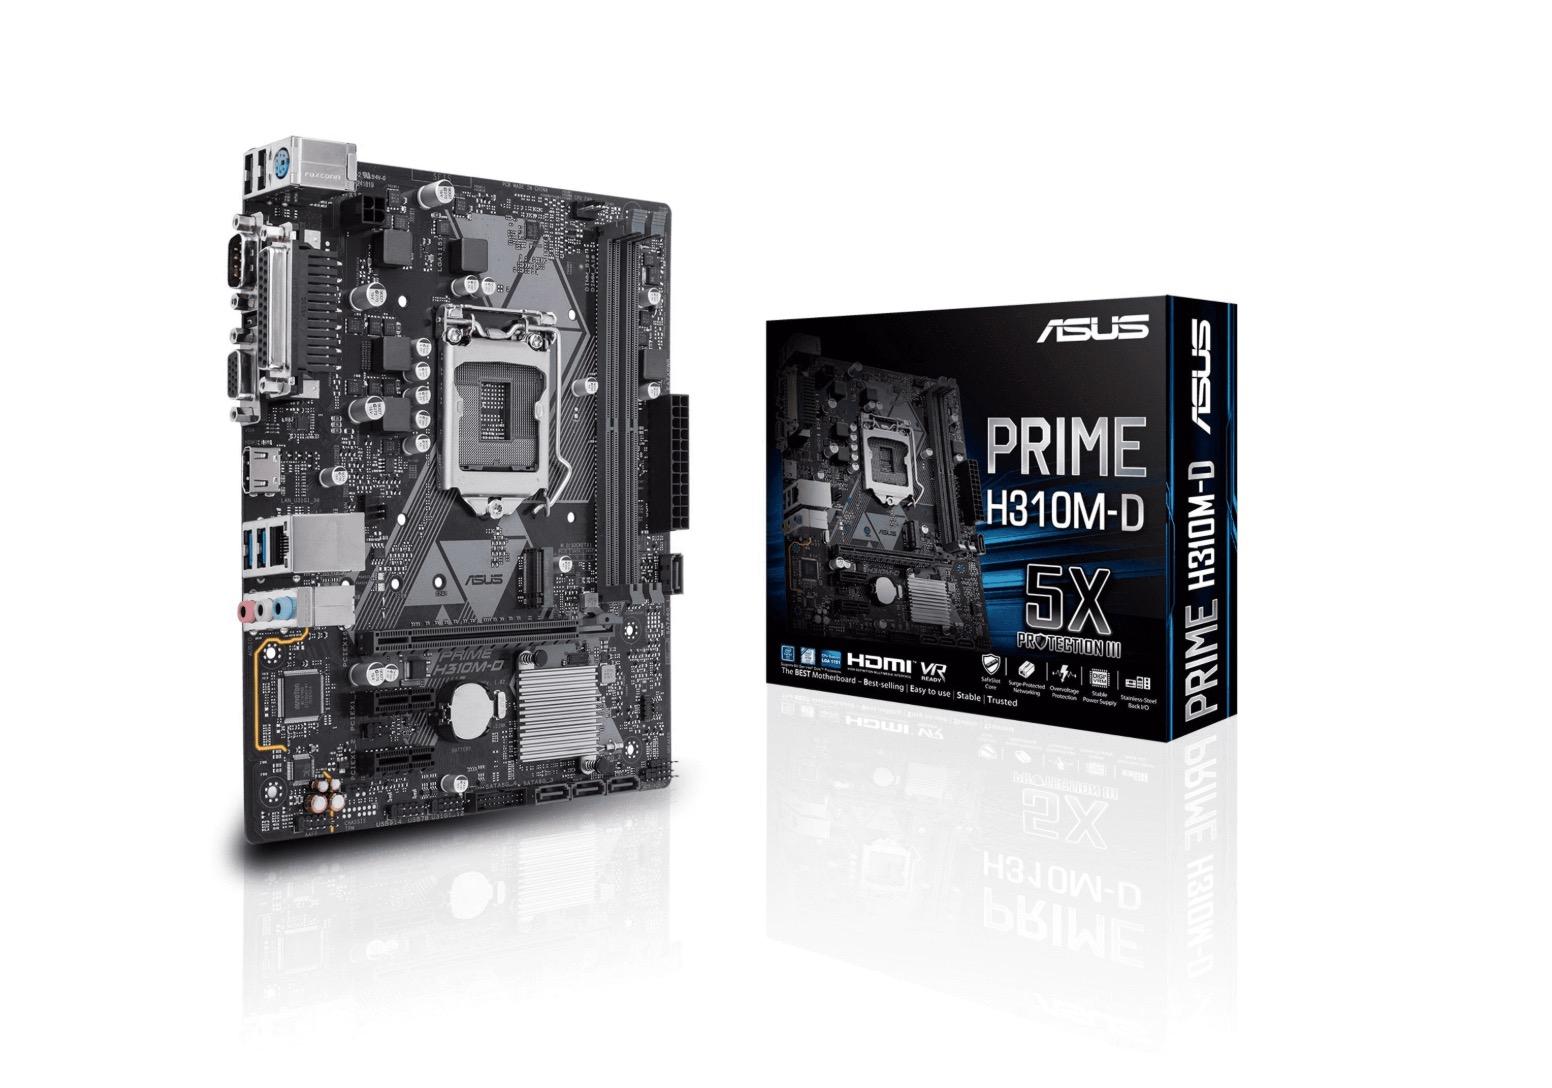 Mainboard ASUS PRIME H310M-D R2.0 (Intel,1151,DDR4,mATX